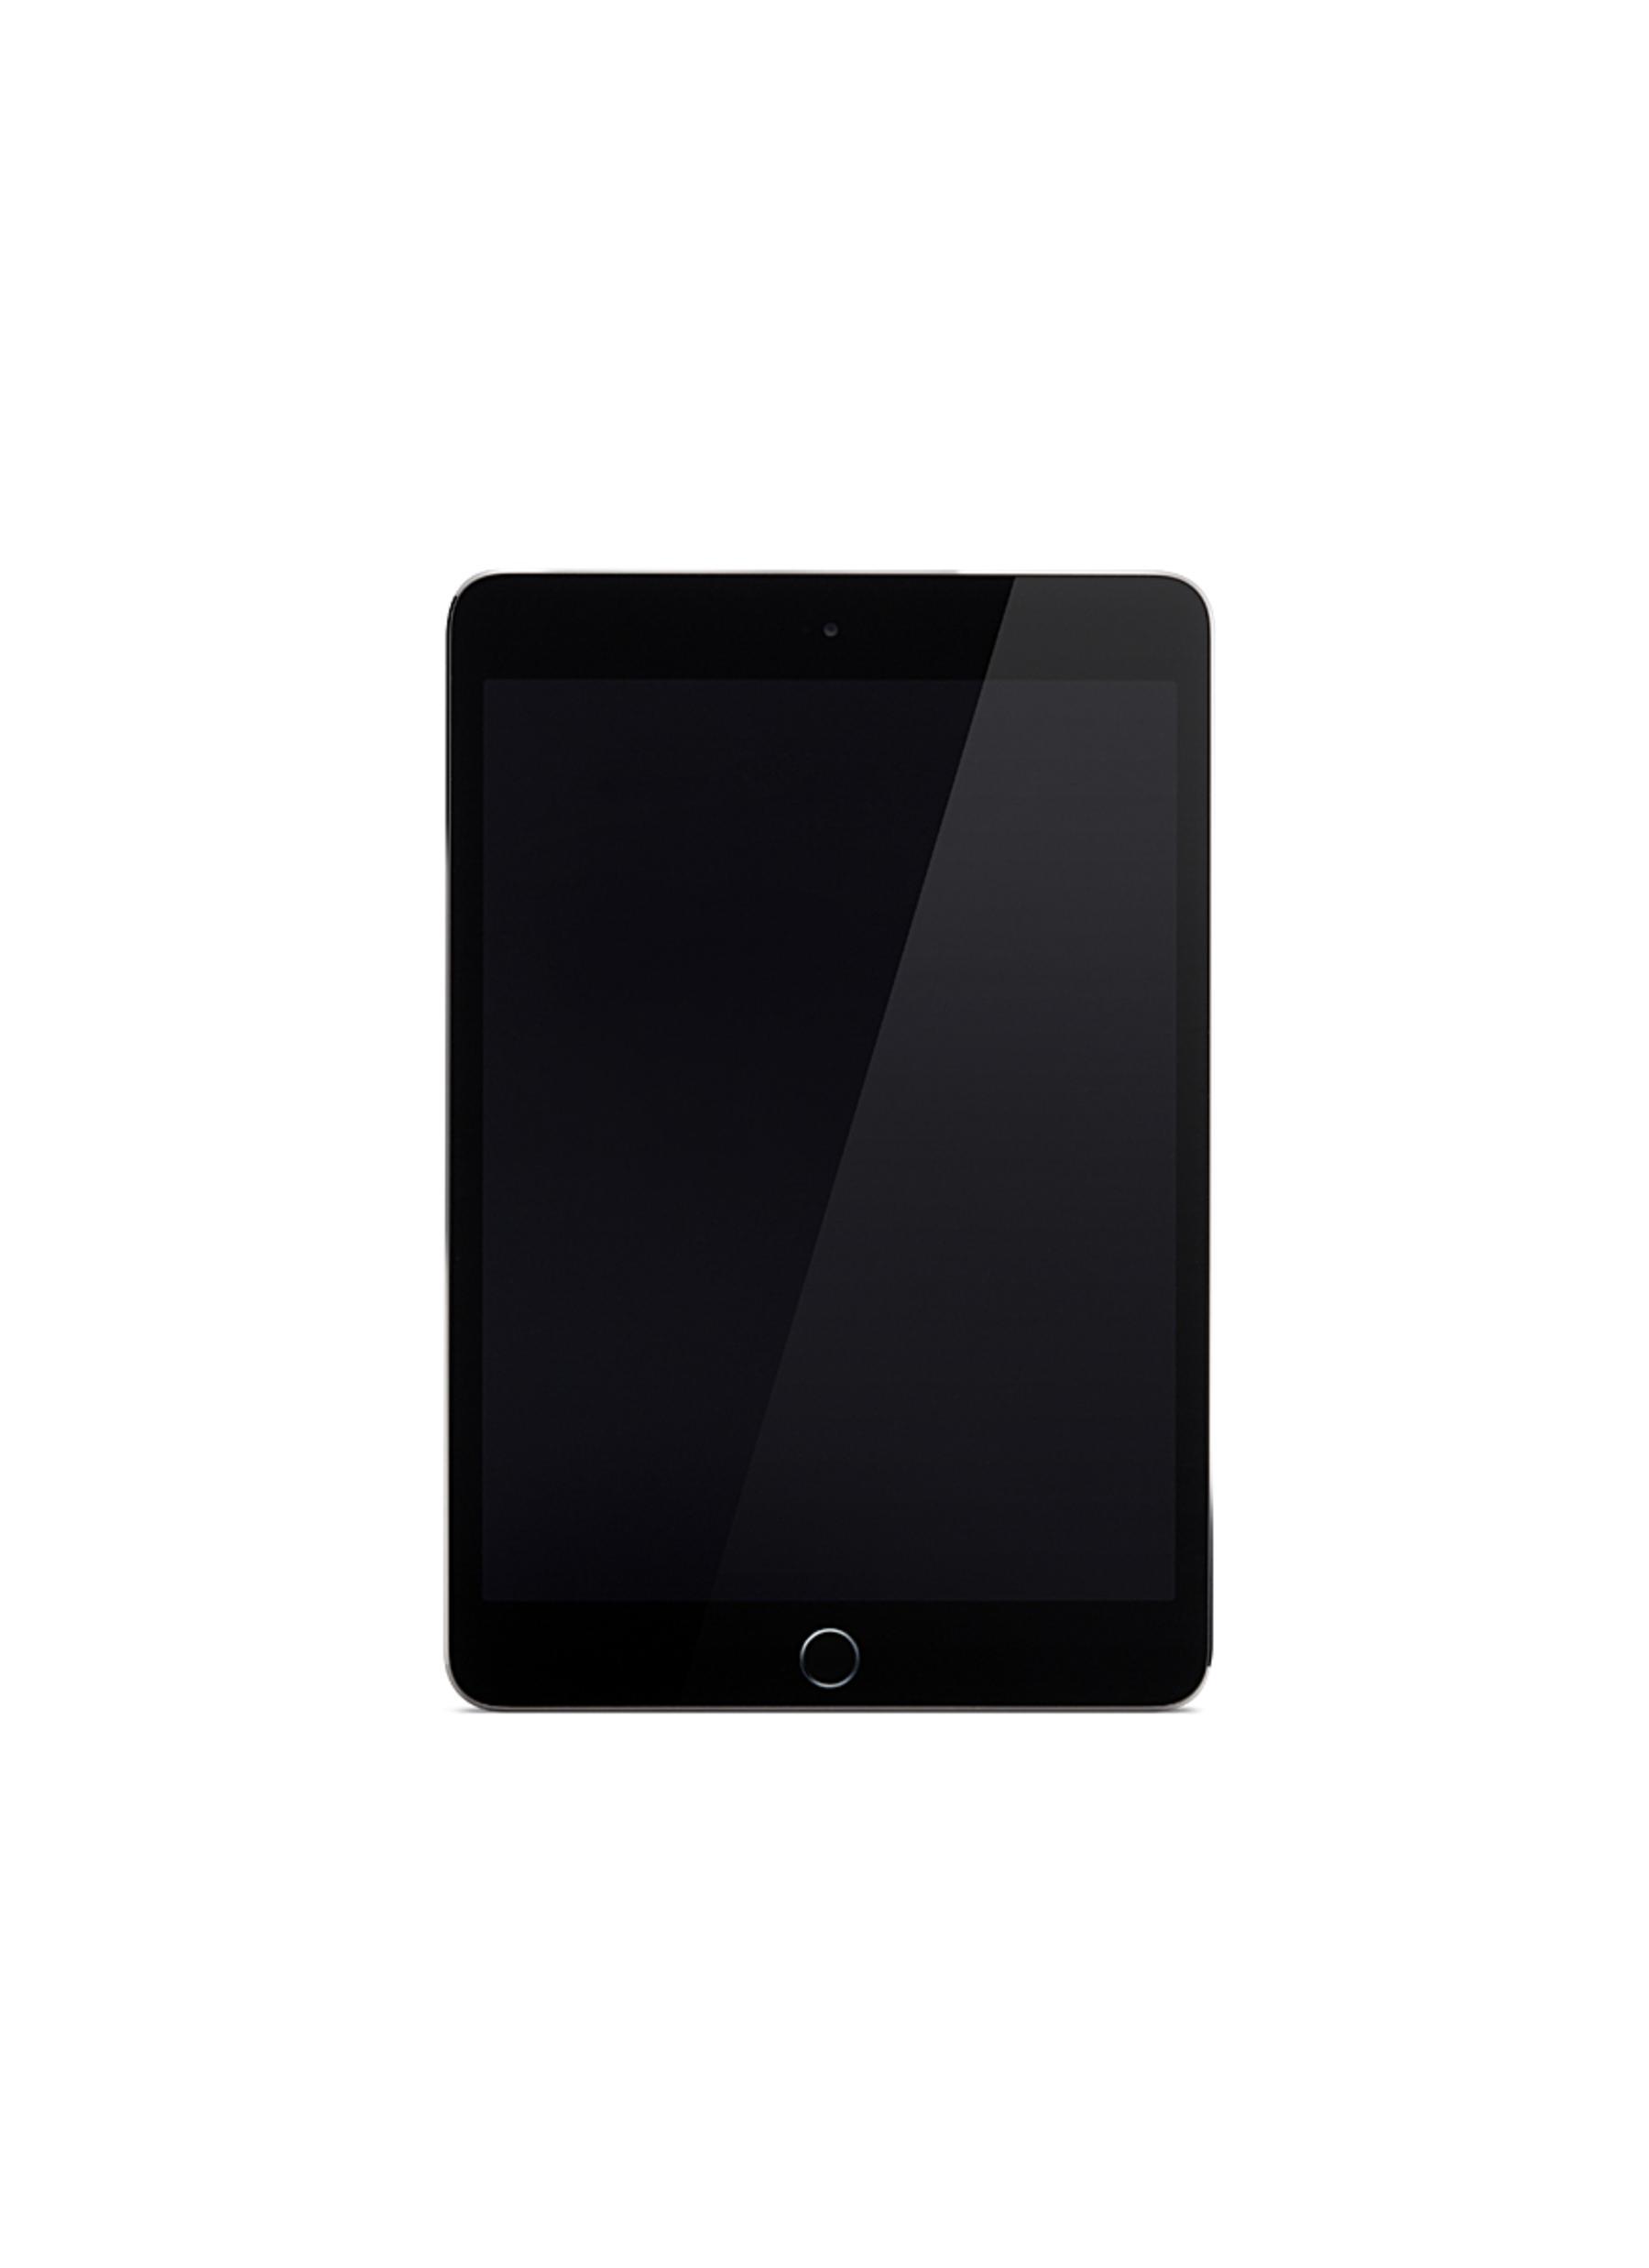 8c140264d Apple. iPad mini 4 Wi-Fi 128GB - Space Gray